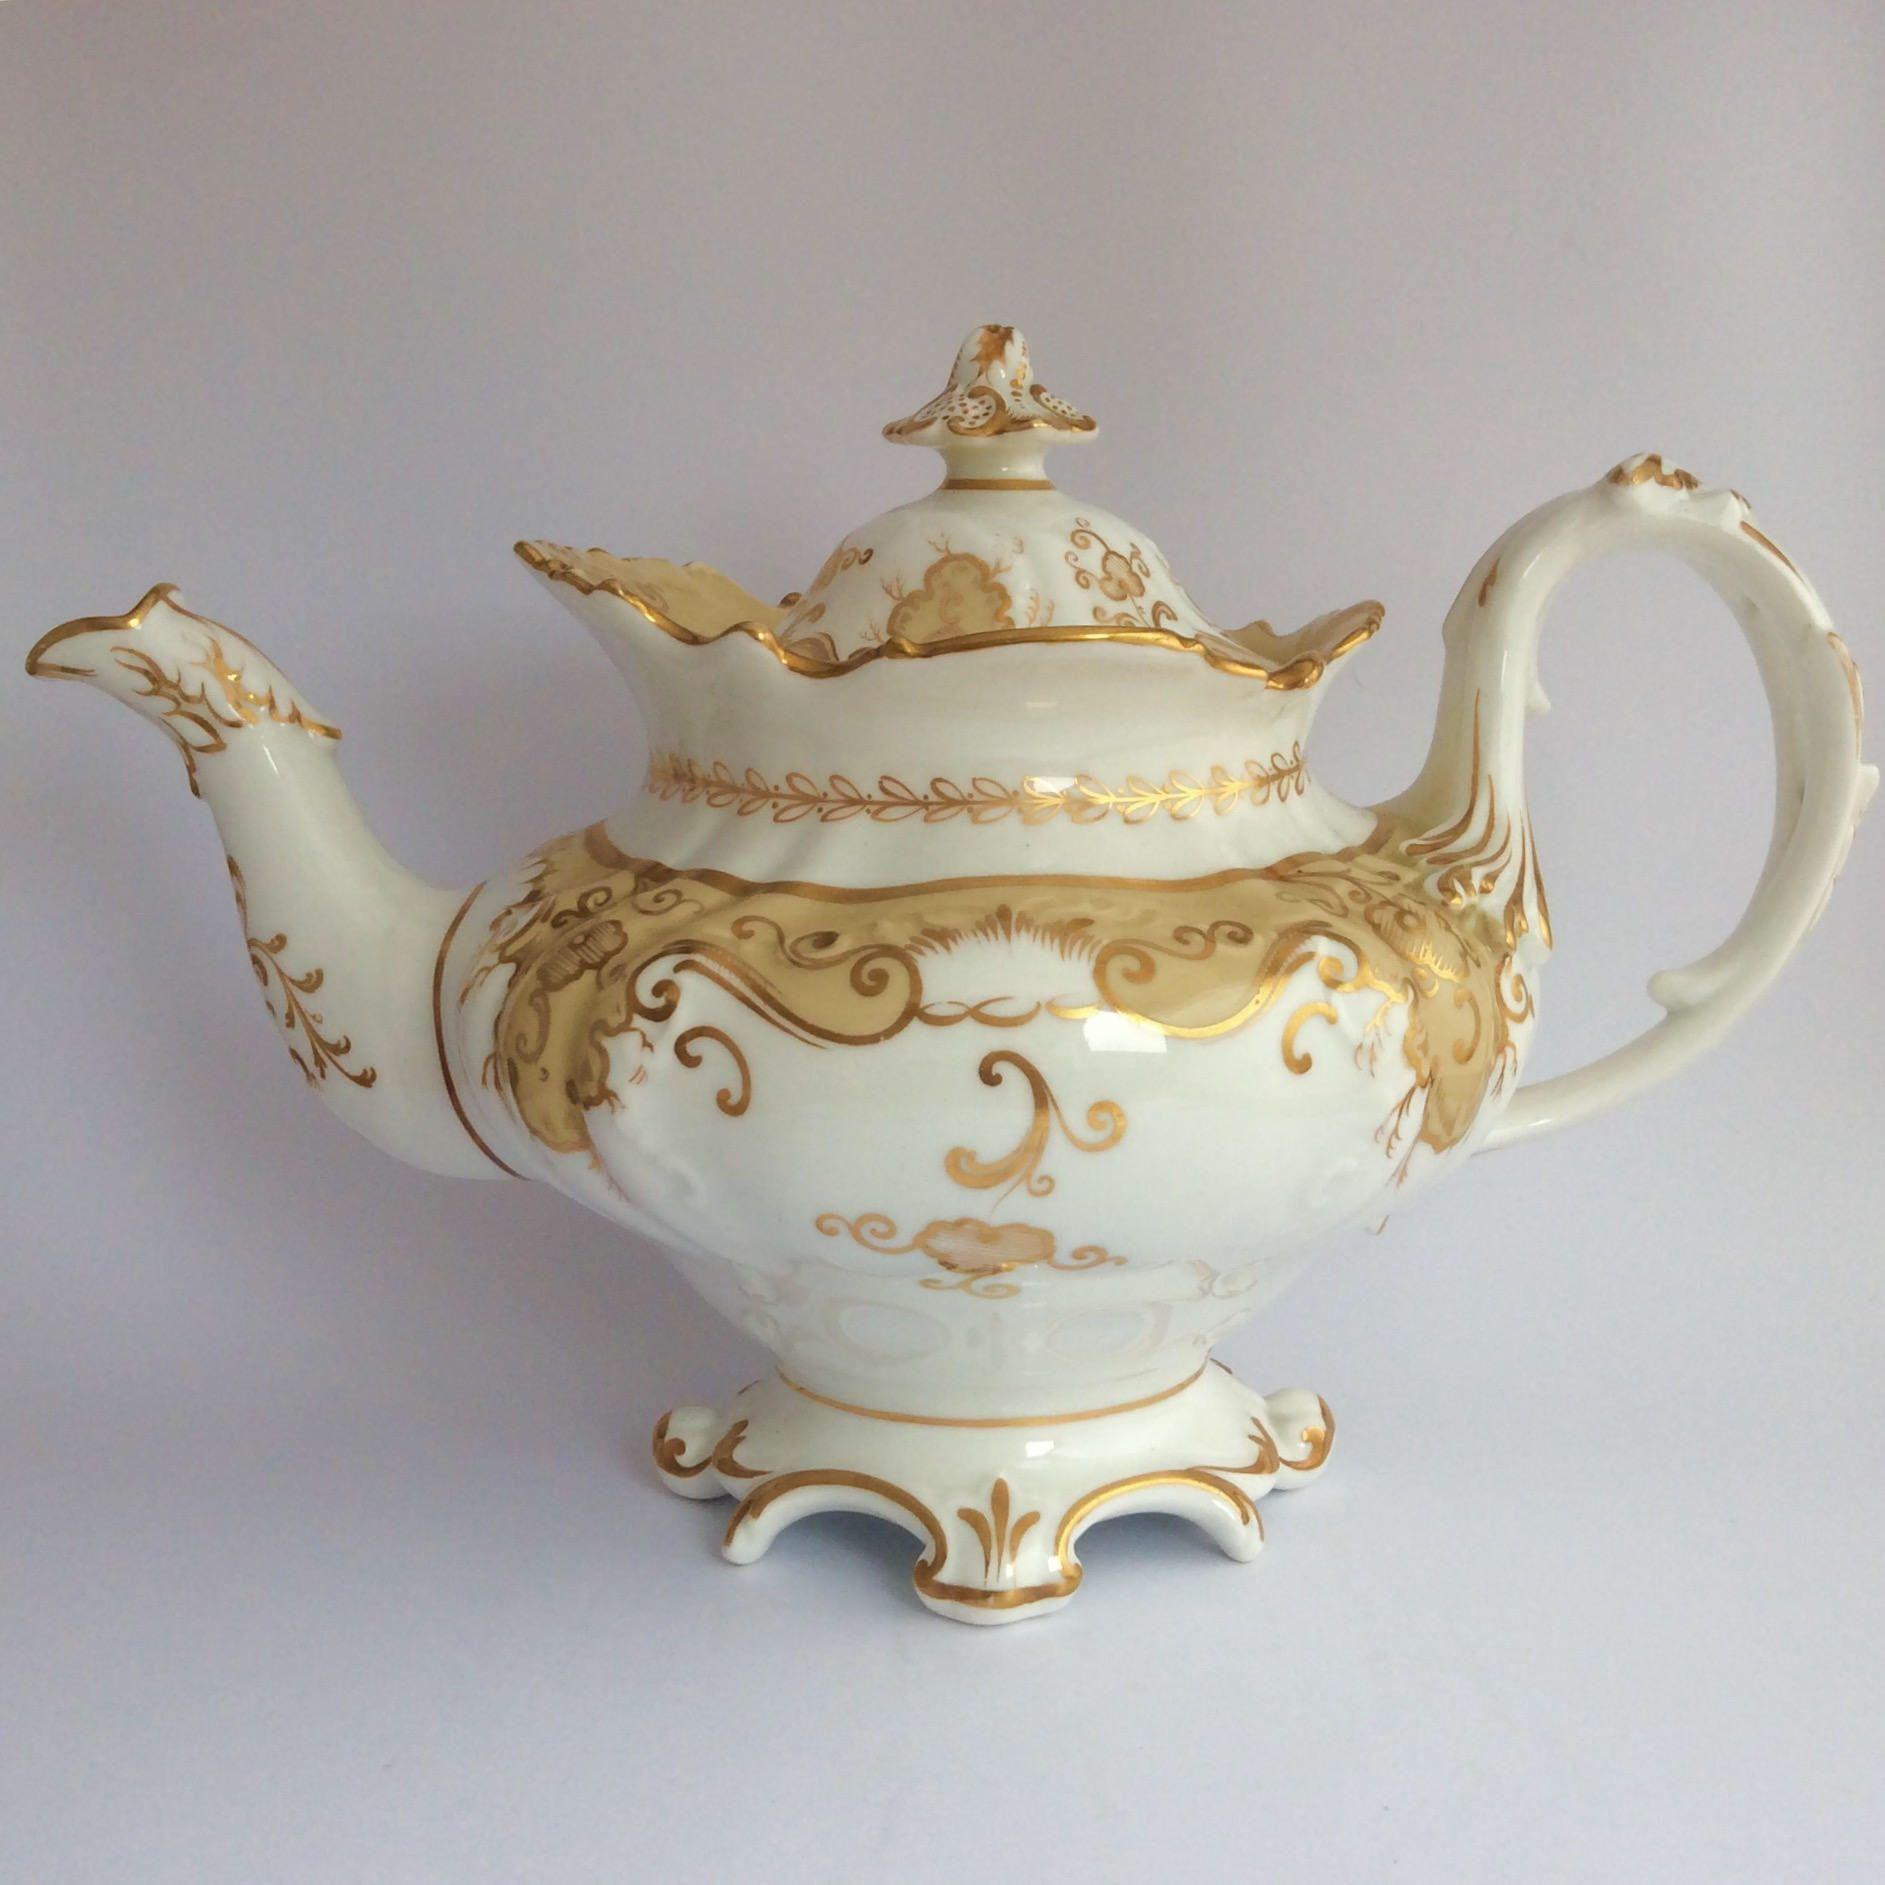 Ridgway Teapot From My Etsy Shop Https Www Etsy Com Uk Listing